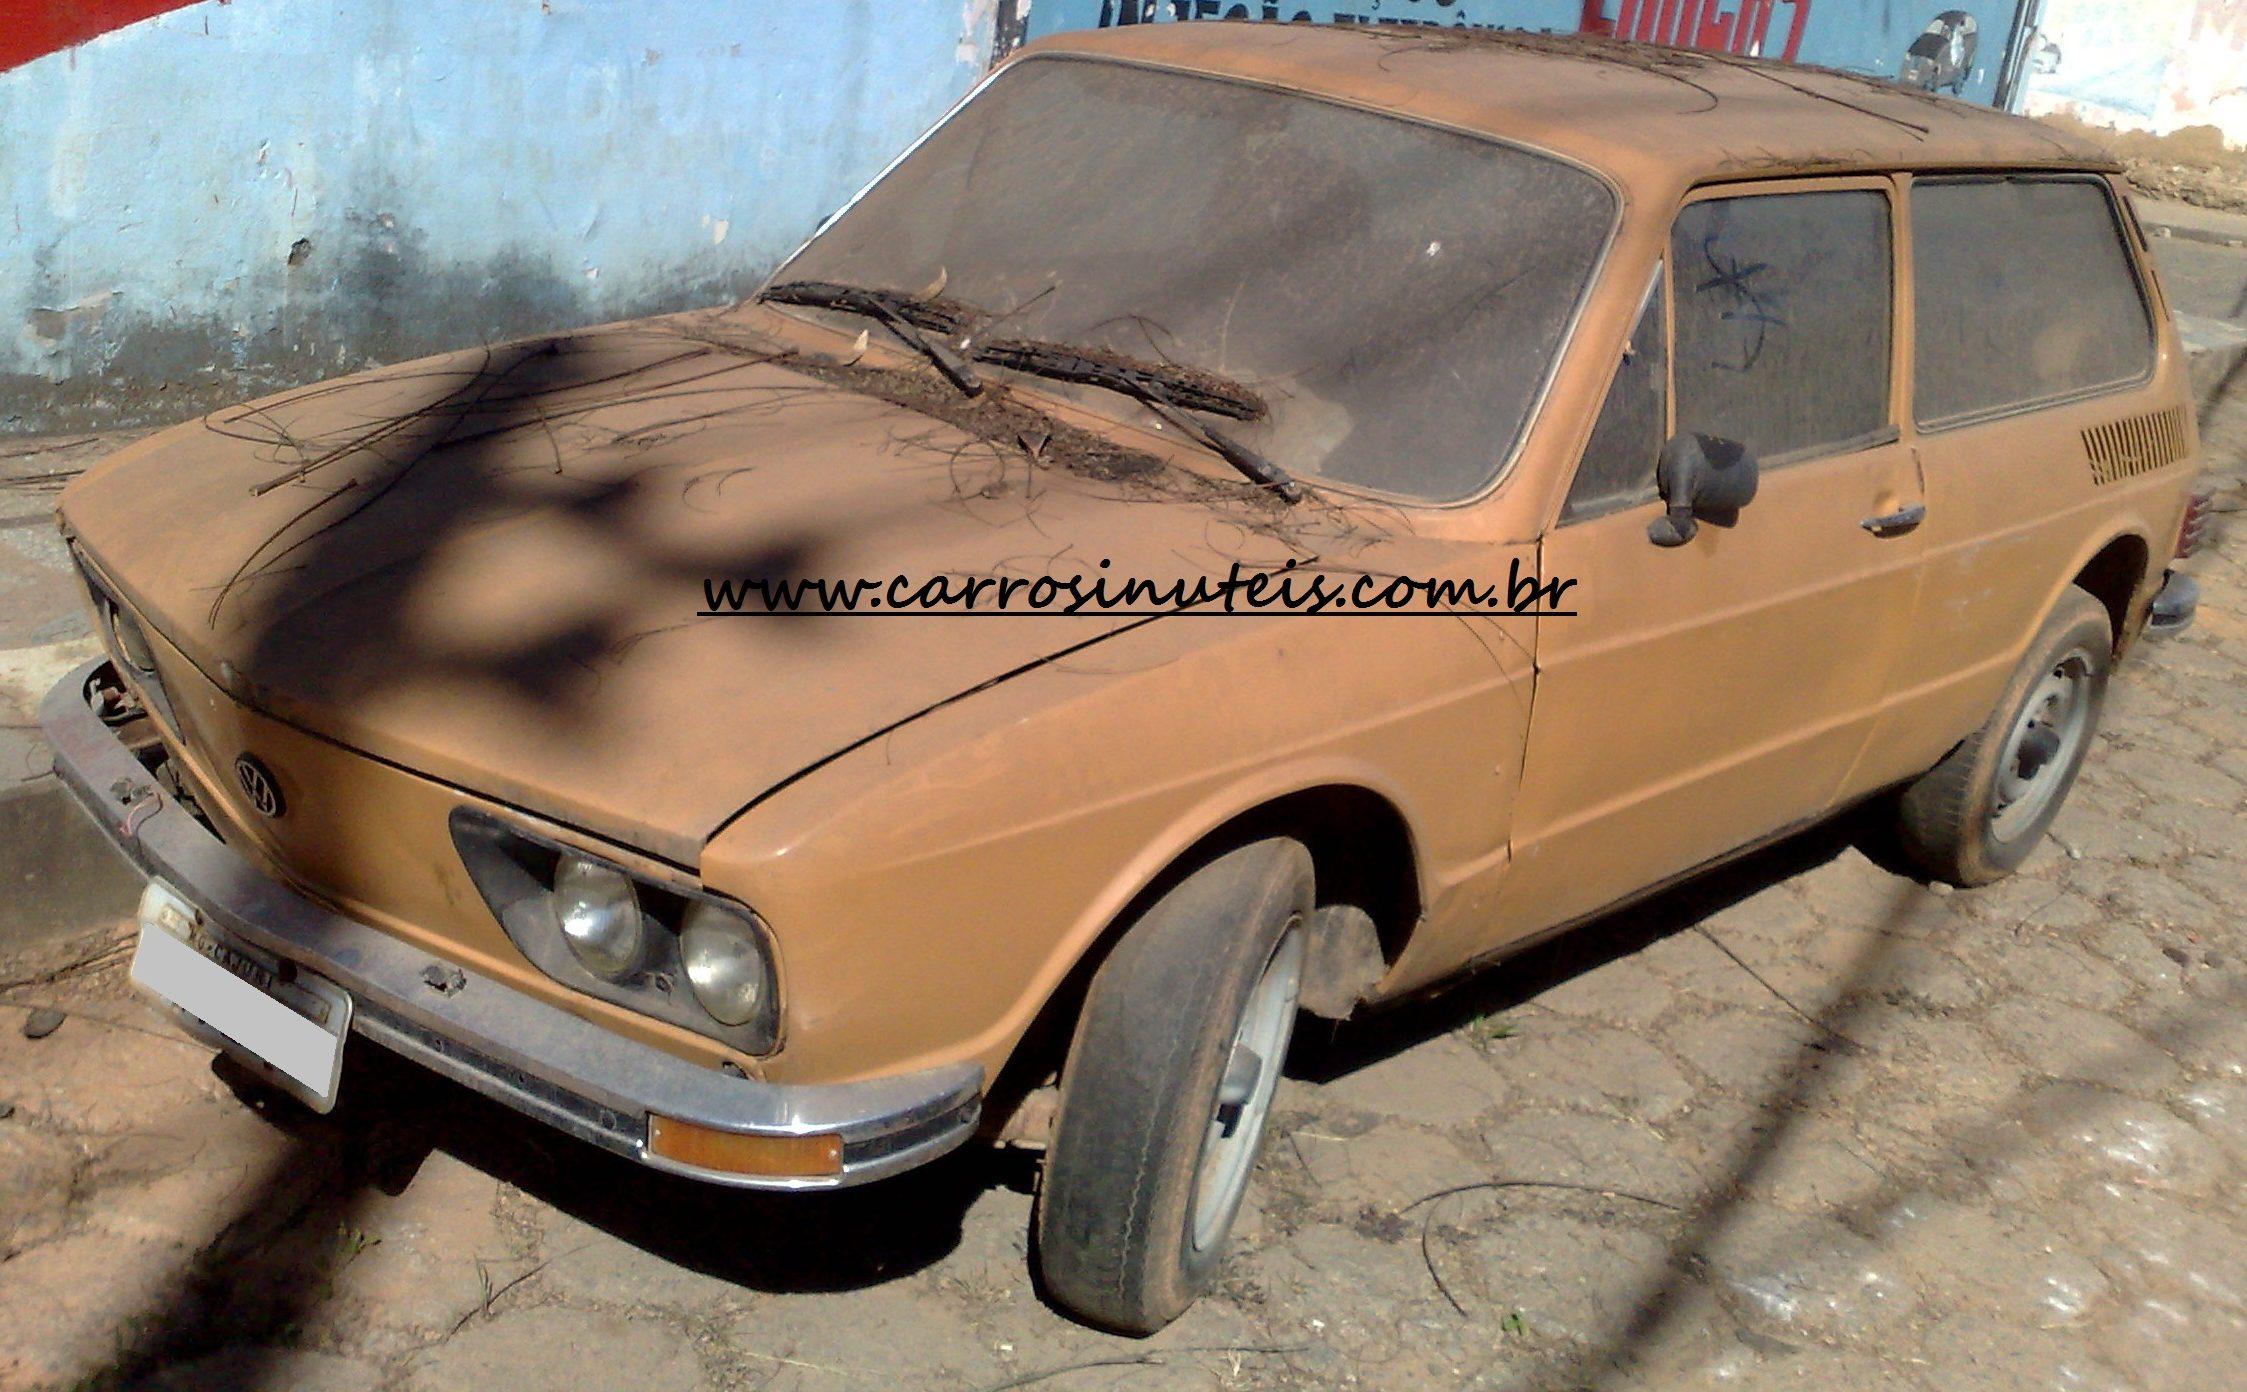 gui-brasa-viçosa-mg VW Brasilia, Gui, Viçosa, MG